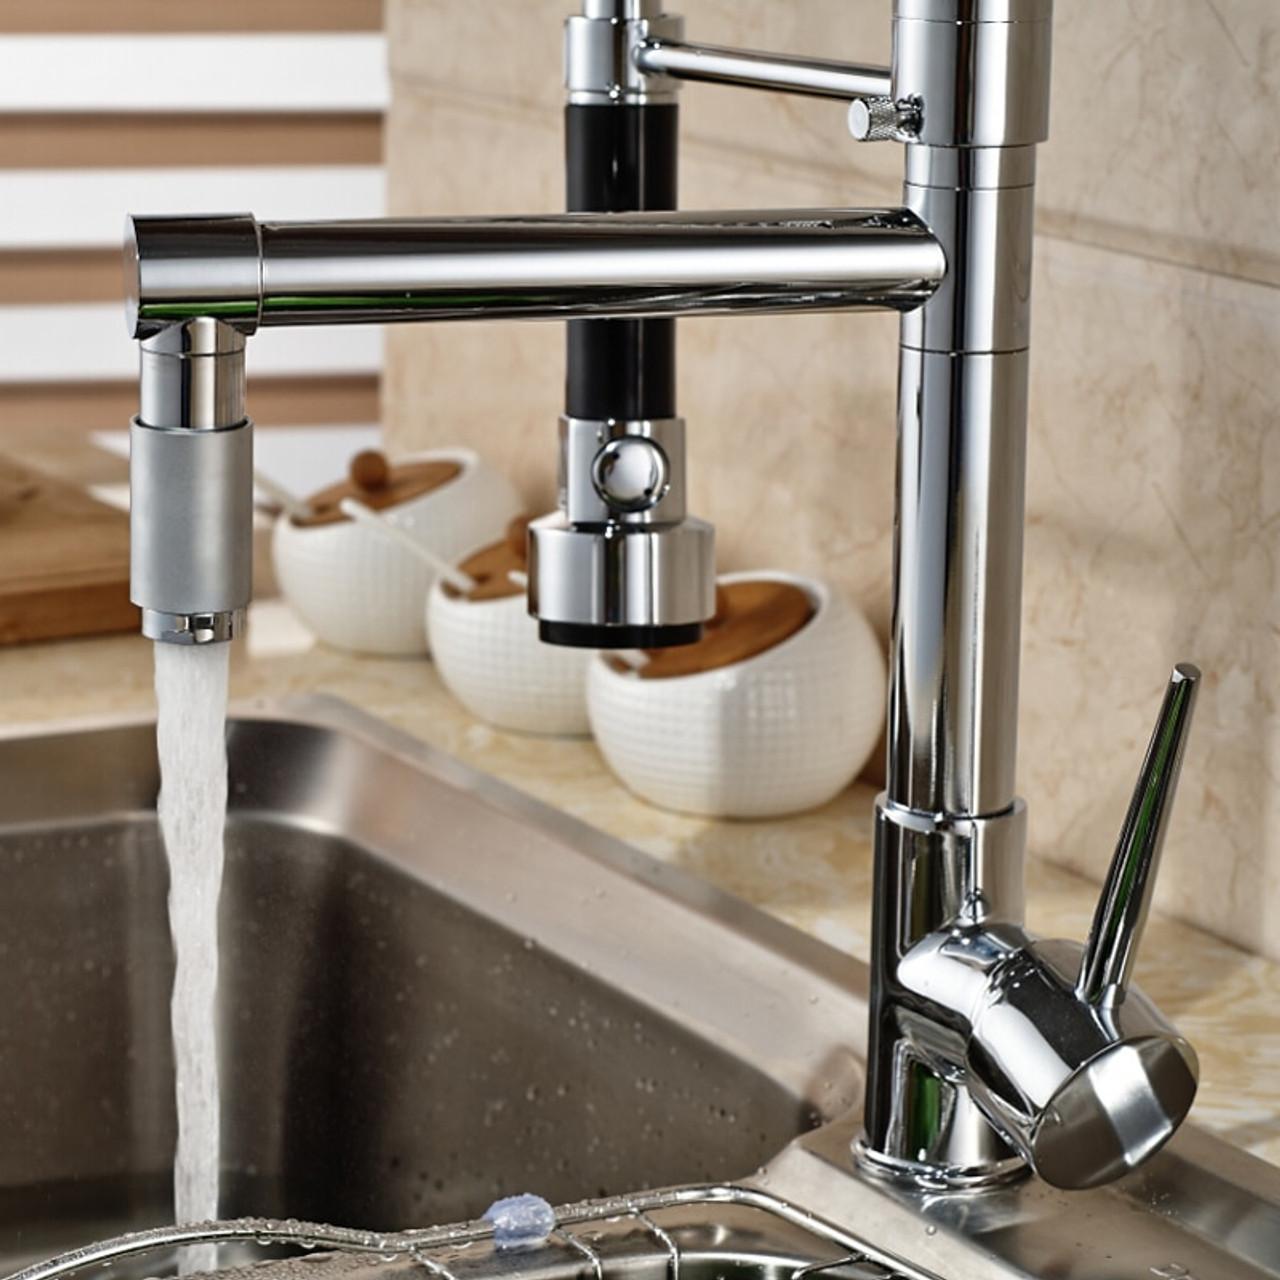 best quality wholesale and retail hot sale chrome brass kitchen faucet dual spout swivel bar vessel sink mixer tap deck mounted